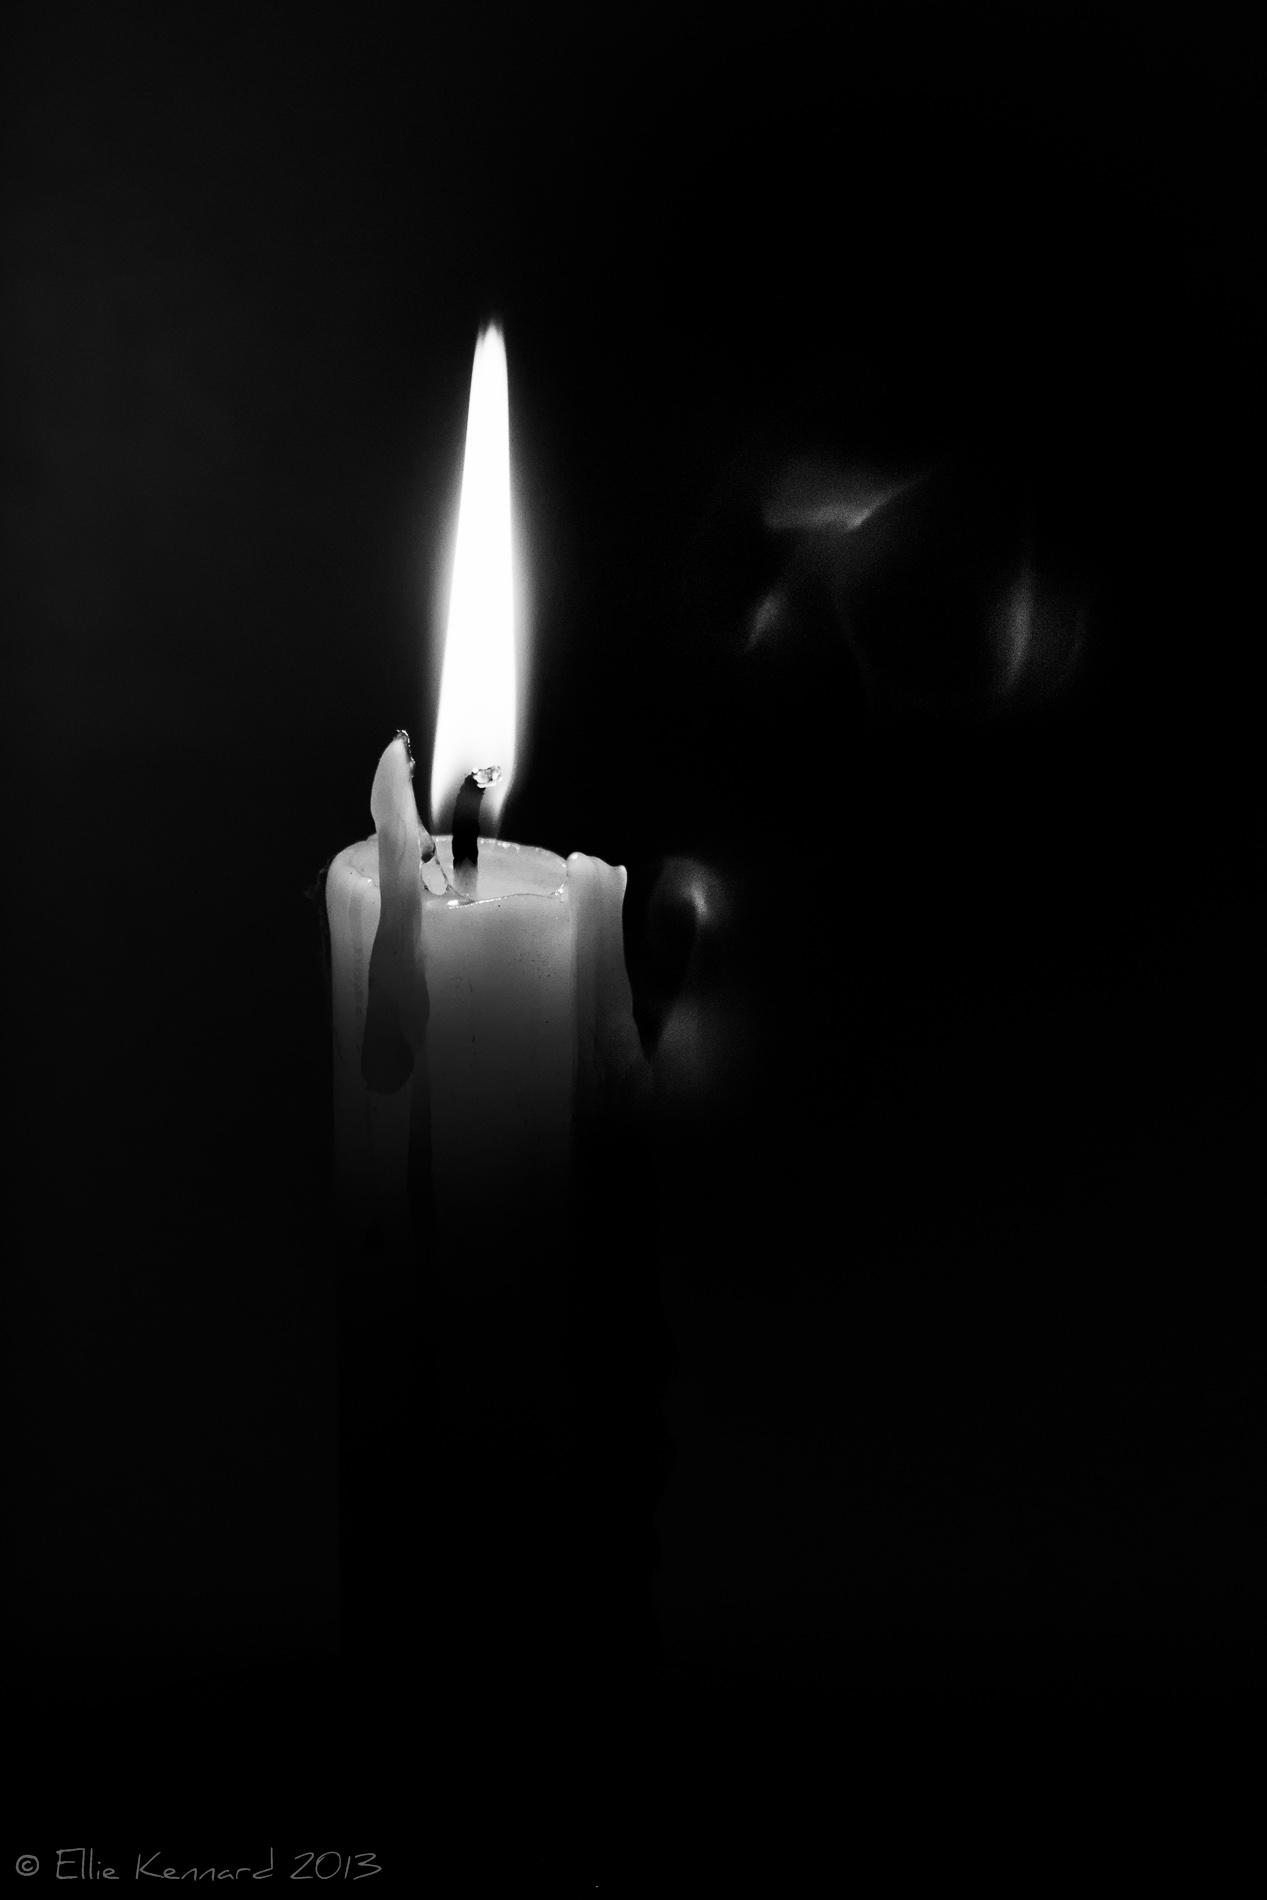 Night Light - Ellie Kennard 2013